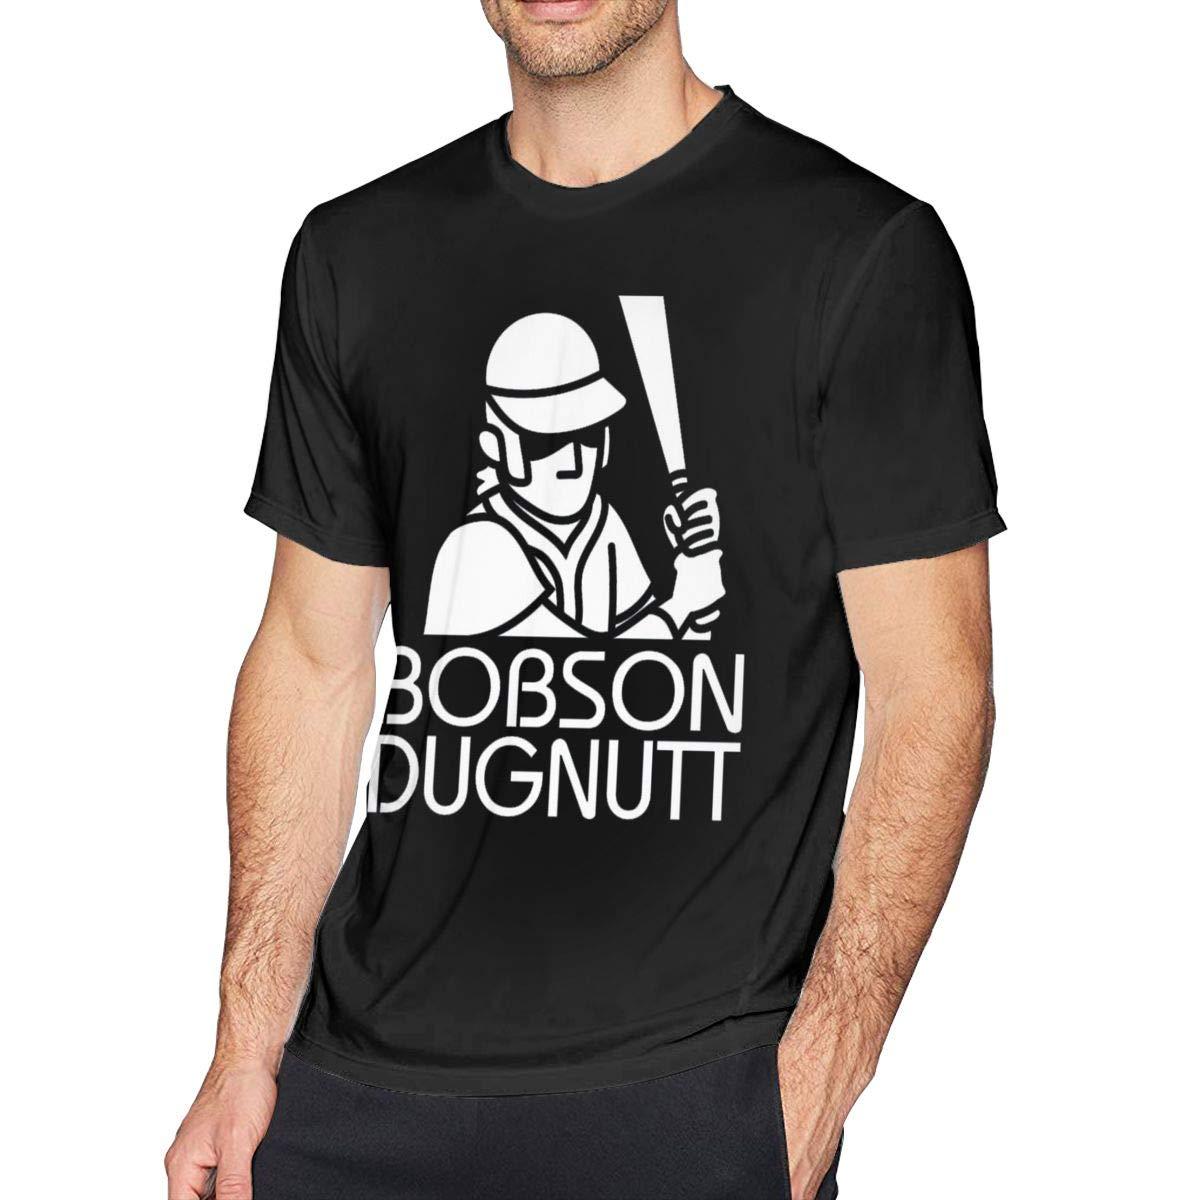 JiaBa Bobson Dugnutt Dark Mens Short Sleeve T-Shirt Black